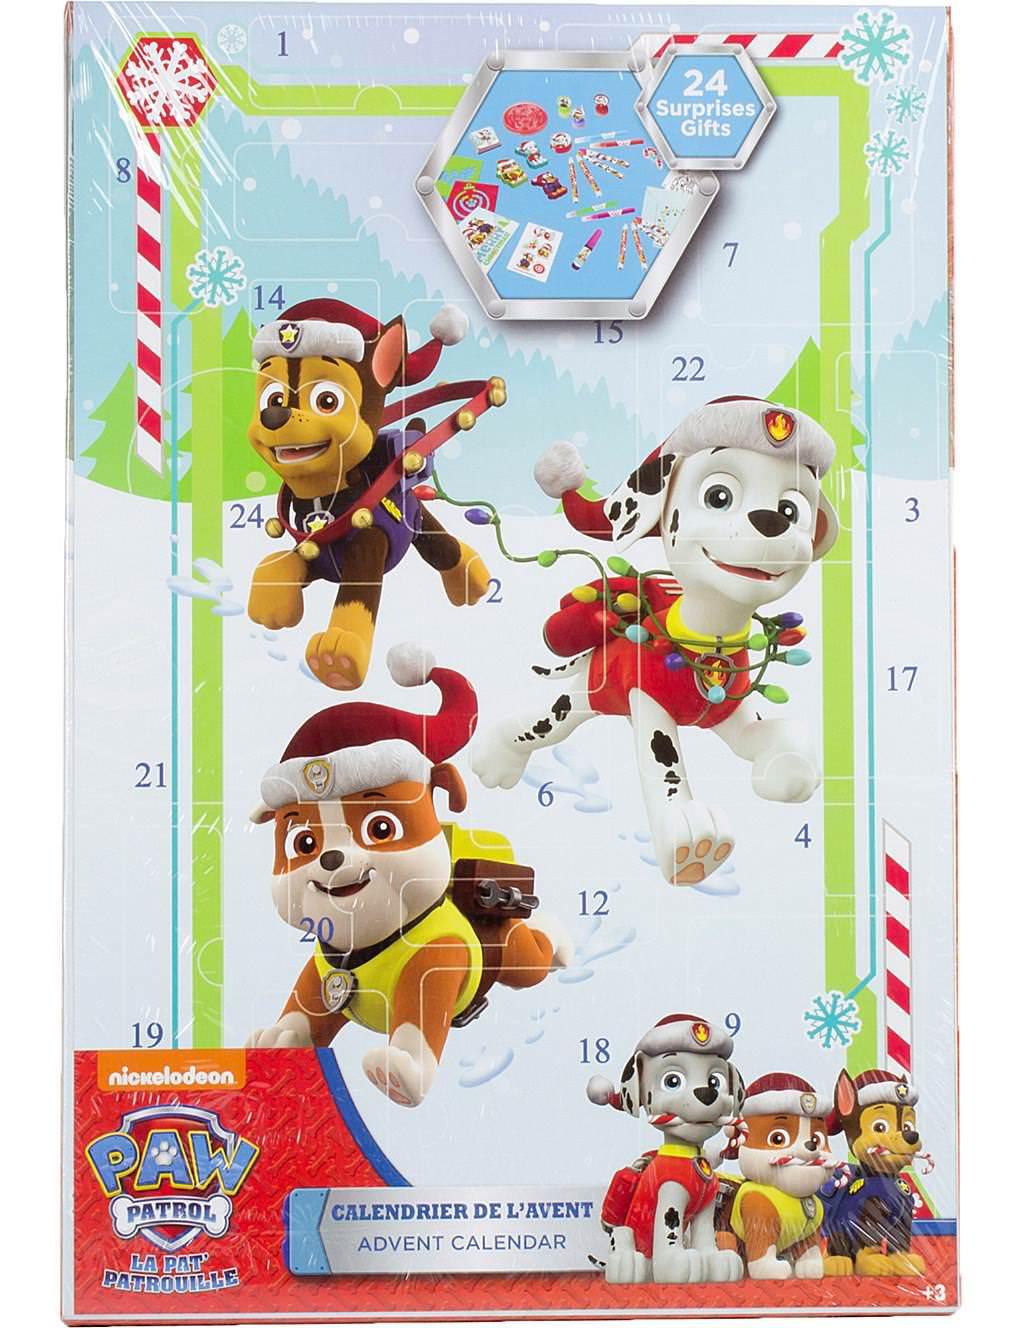 Vlog#2 遲來的聖誕禮物開箱,看我在Selfridges買到台灣沒有的玩具